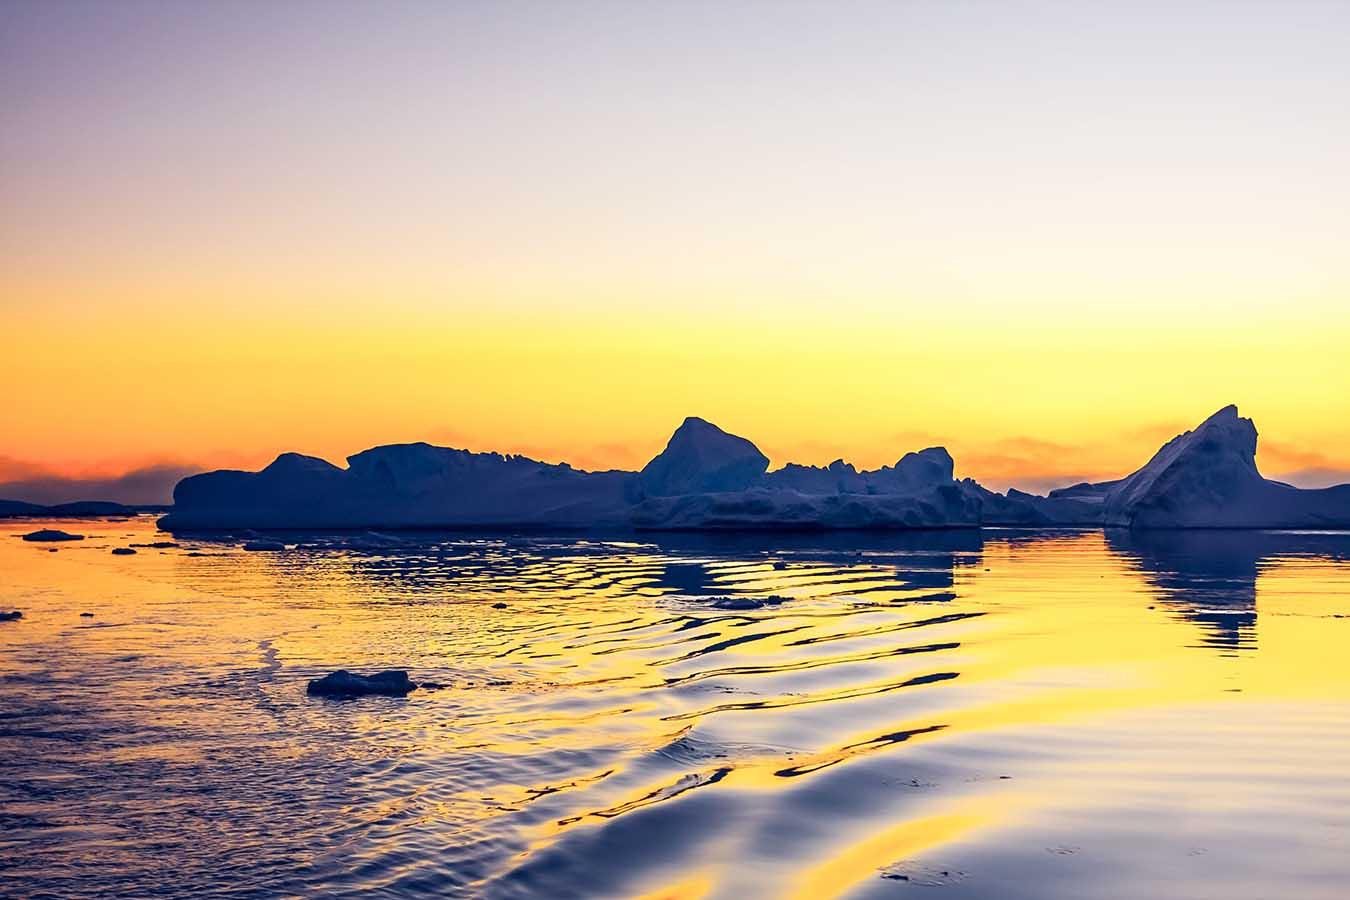 Deshielo en Groenlandia: evolución